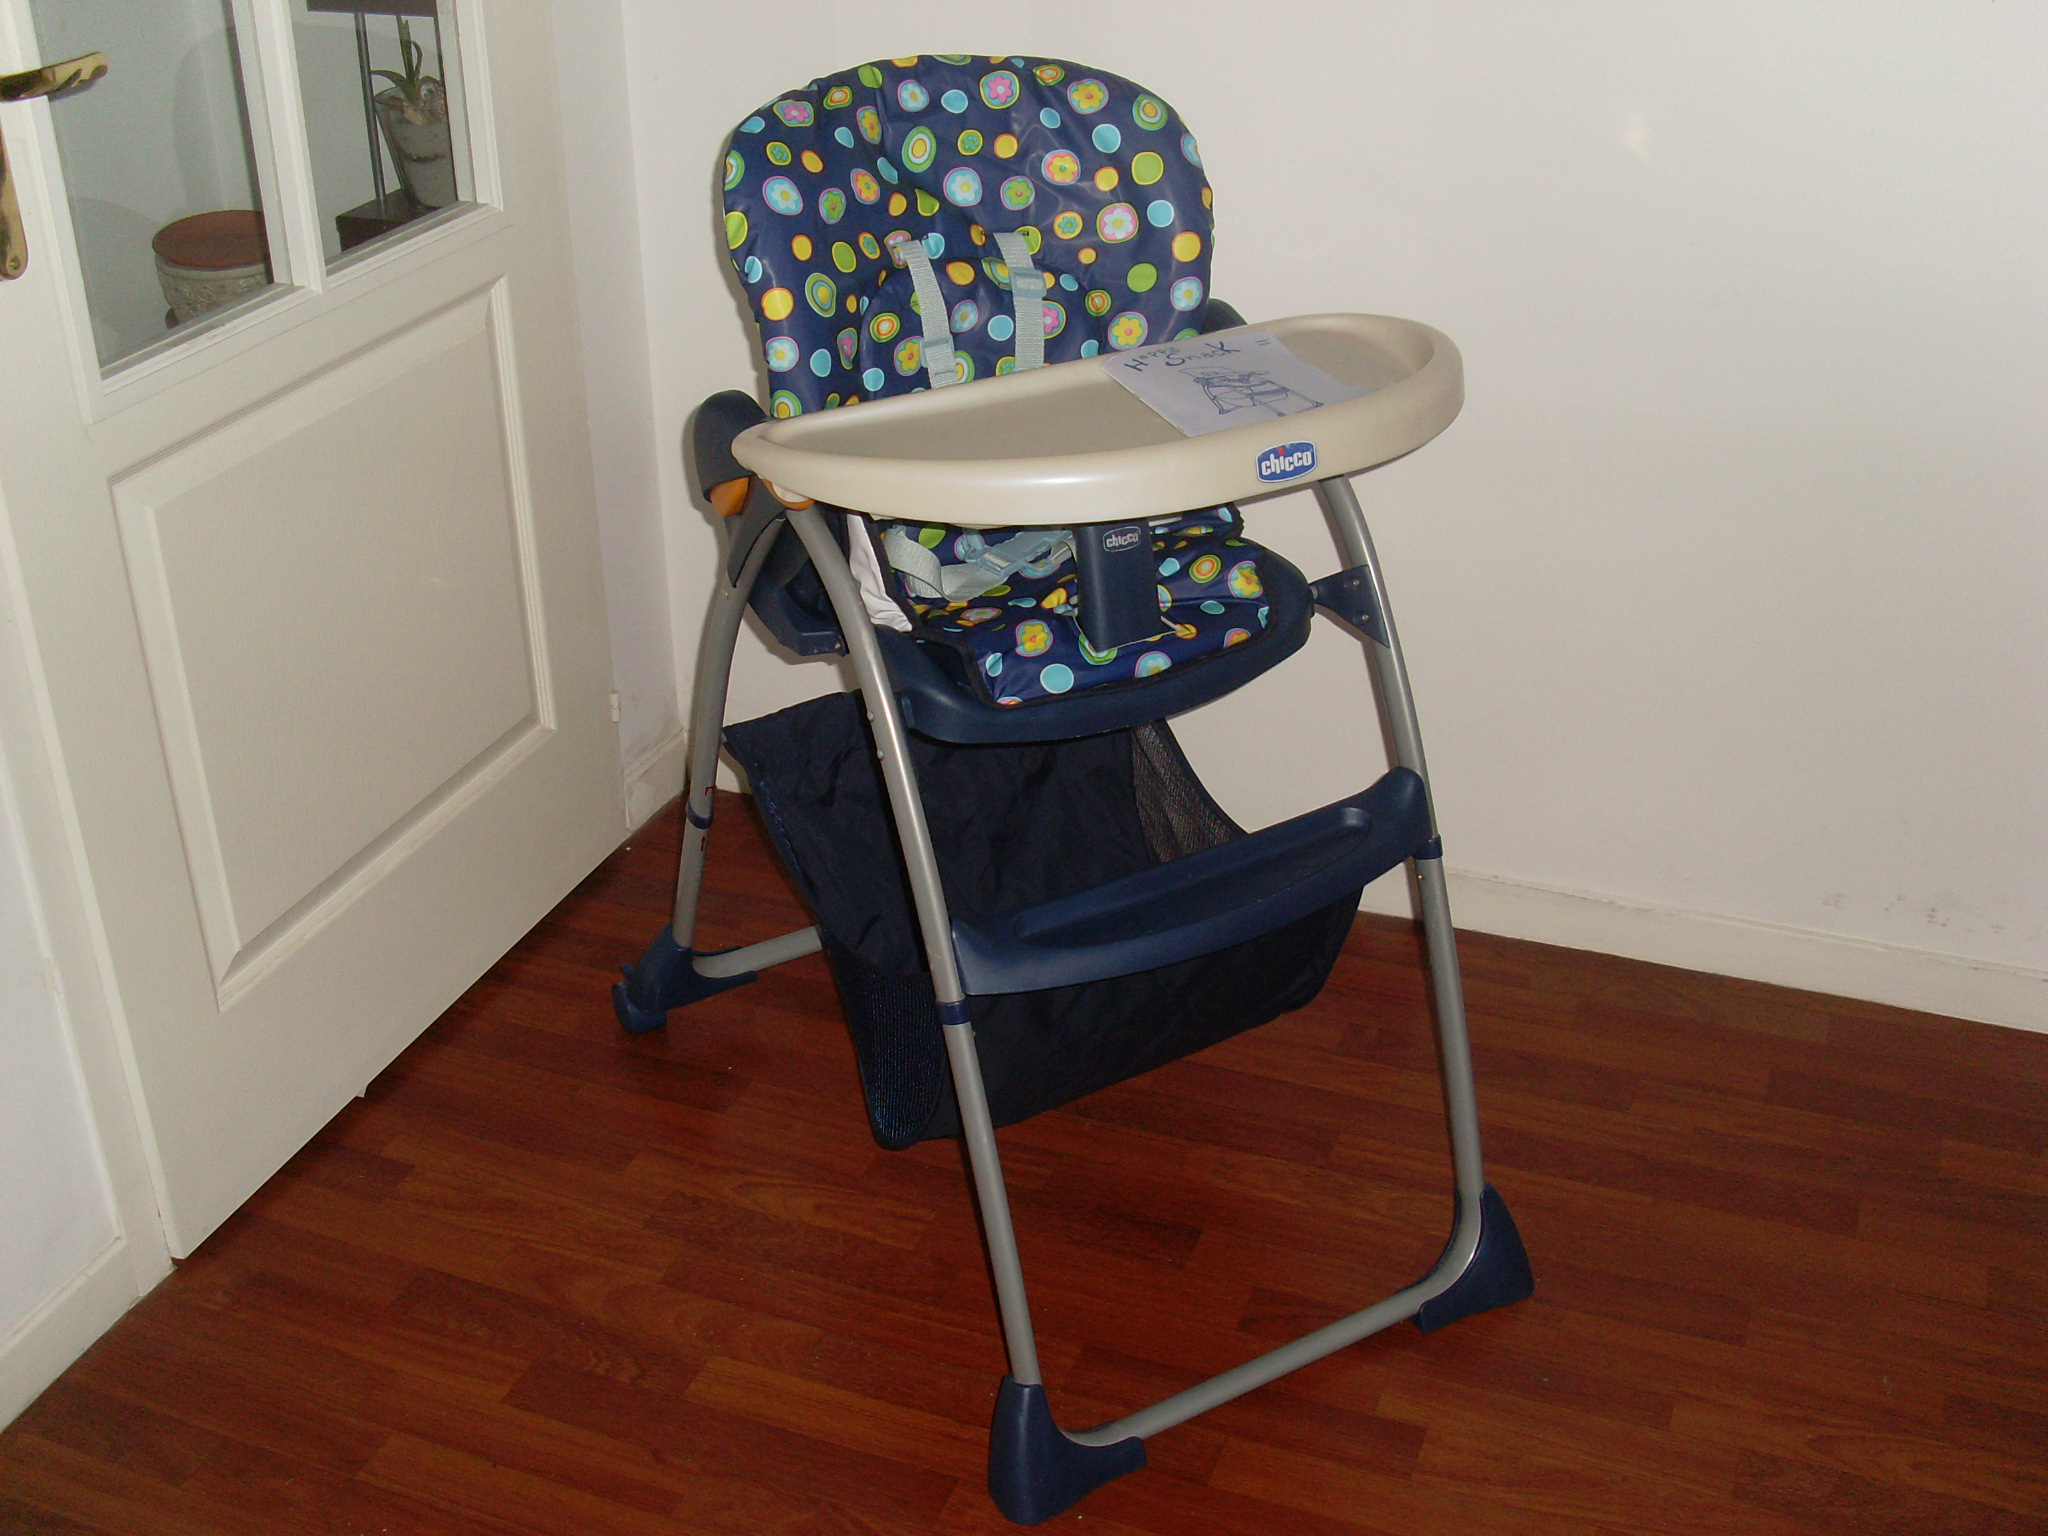 chaise haute chicco vendus shiva59000 photos club doctissimo. Black Bedroom Furniture Sets. Home Design Ideas